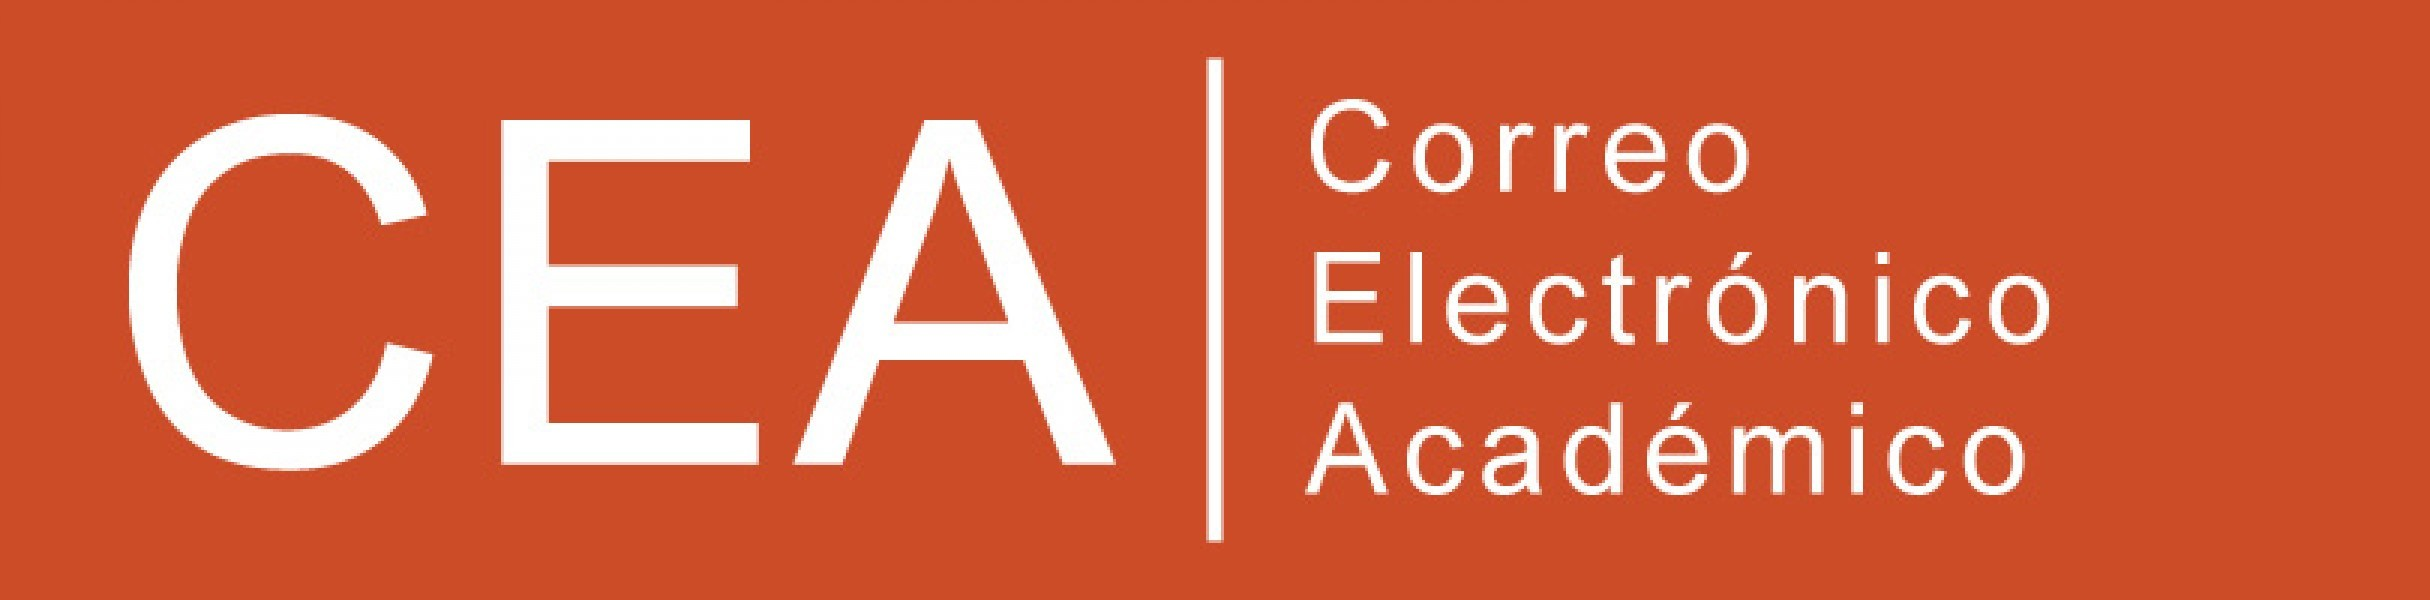 Correo Electrónico Académico (CEA)